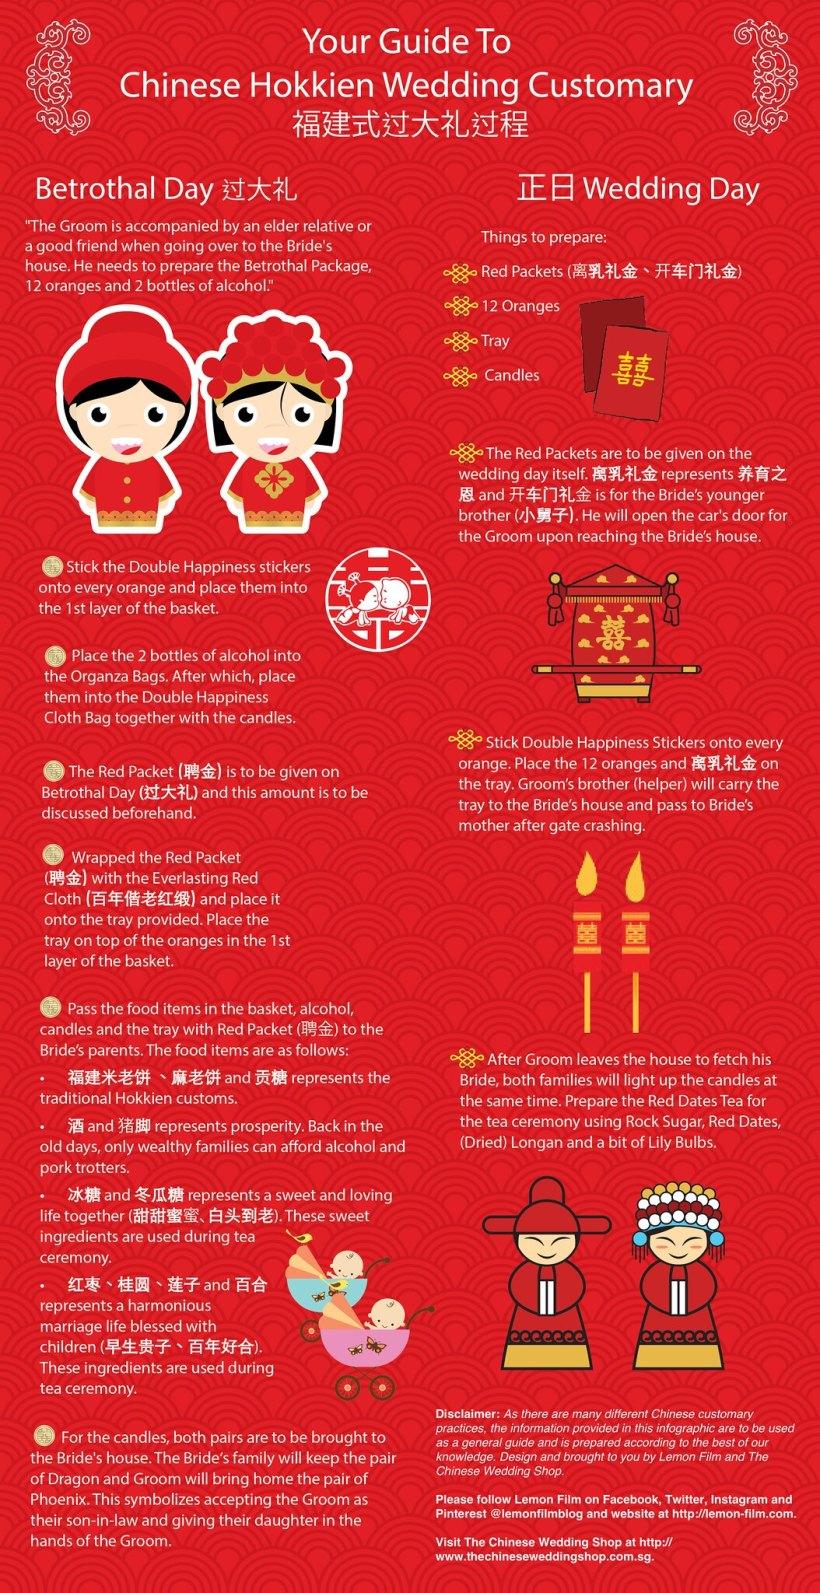 chinese wedding guide | deweddingjpg.com